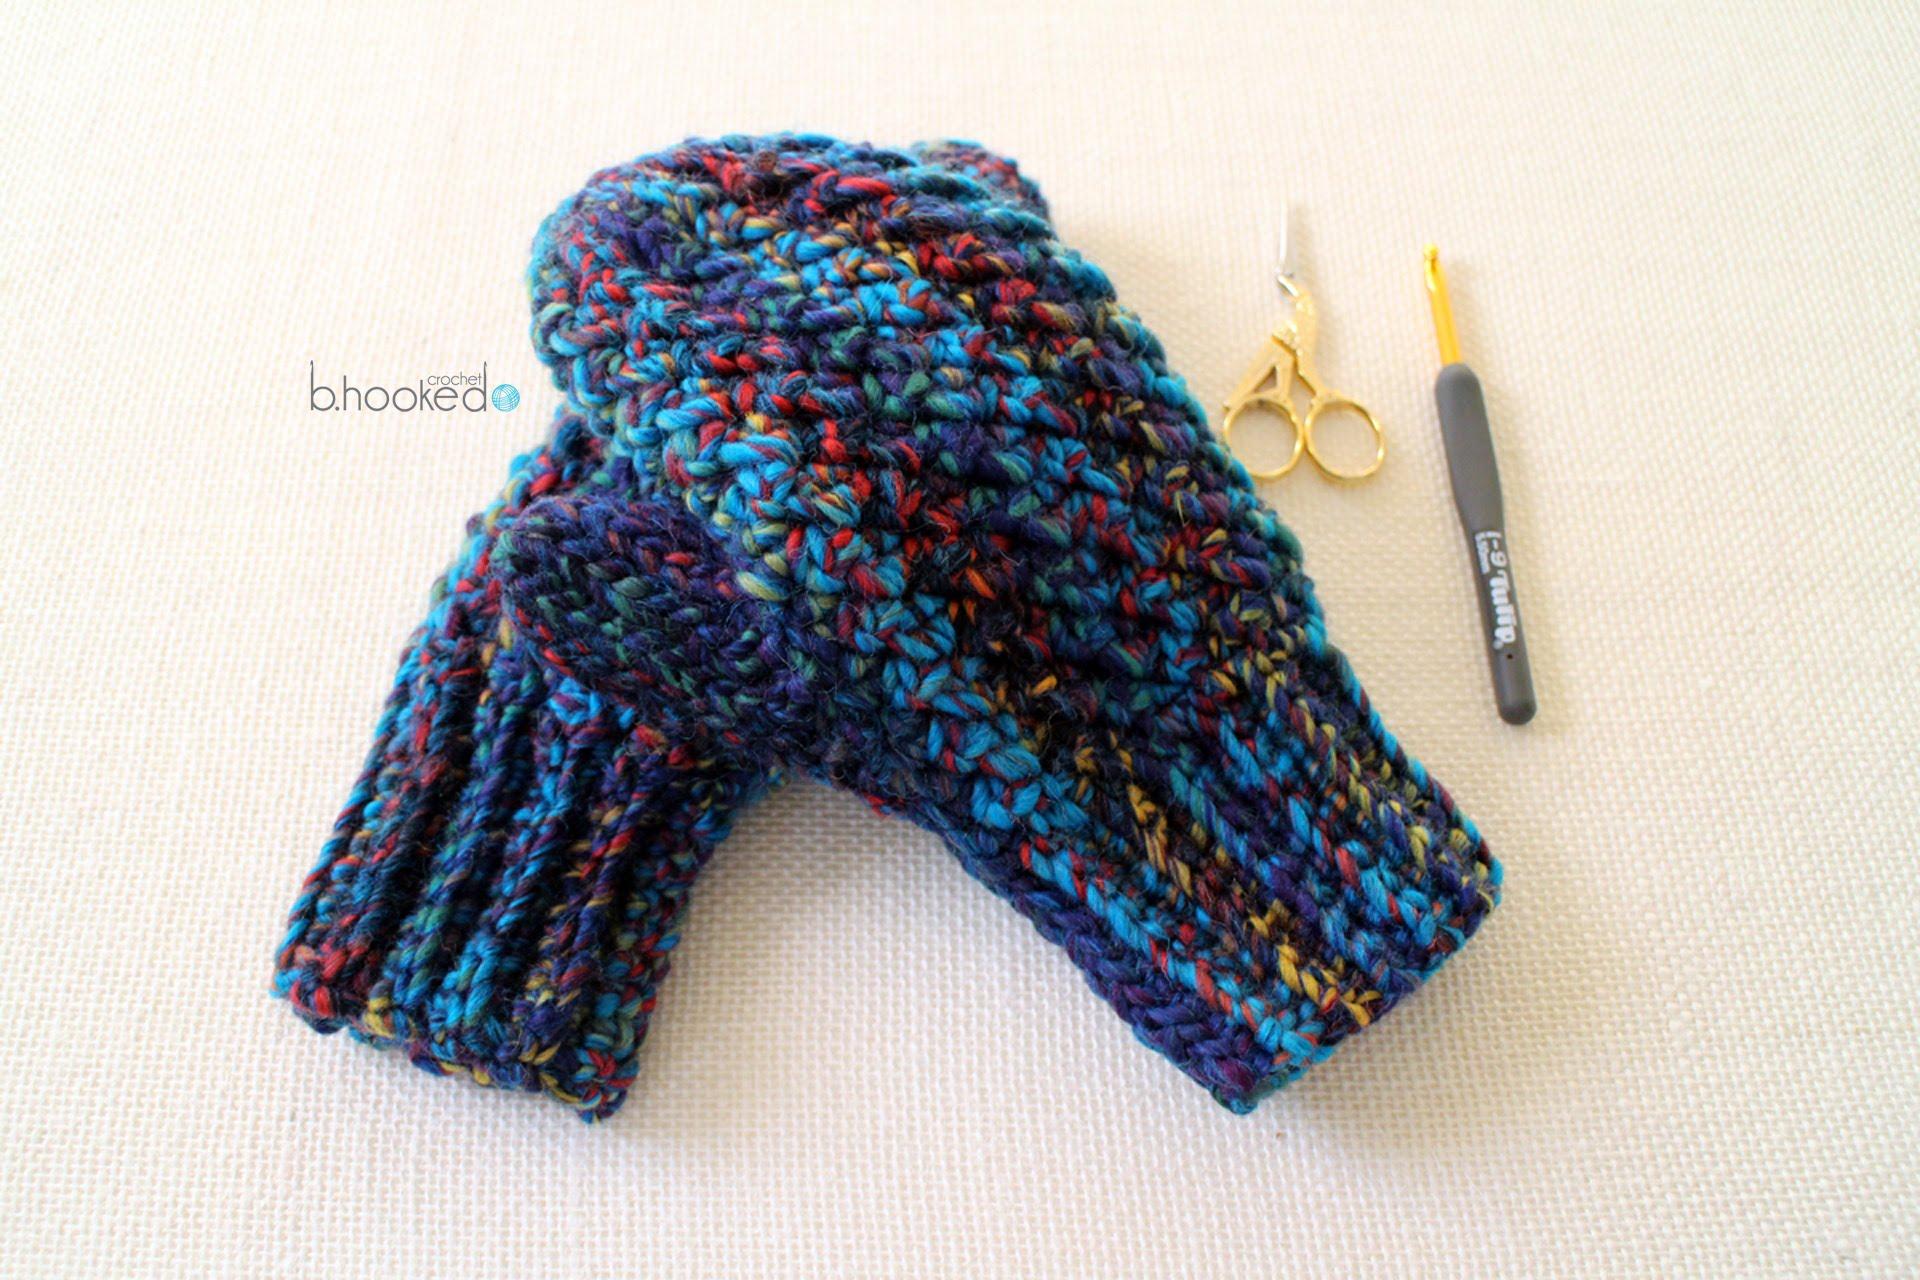 how to crochet mittens - youtube gnpgkeb